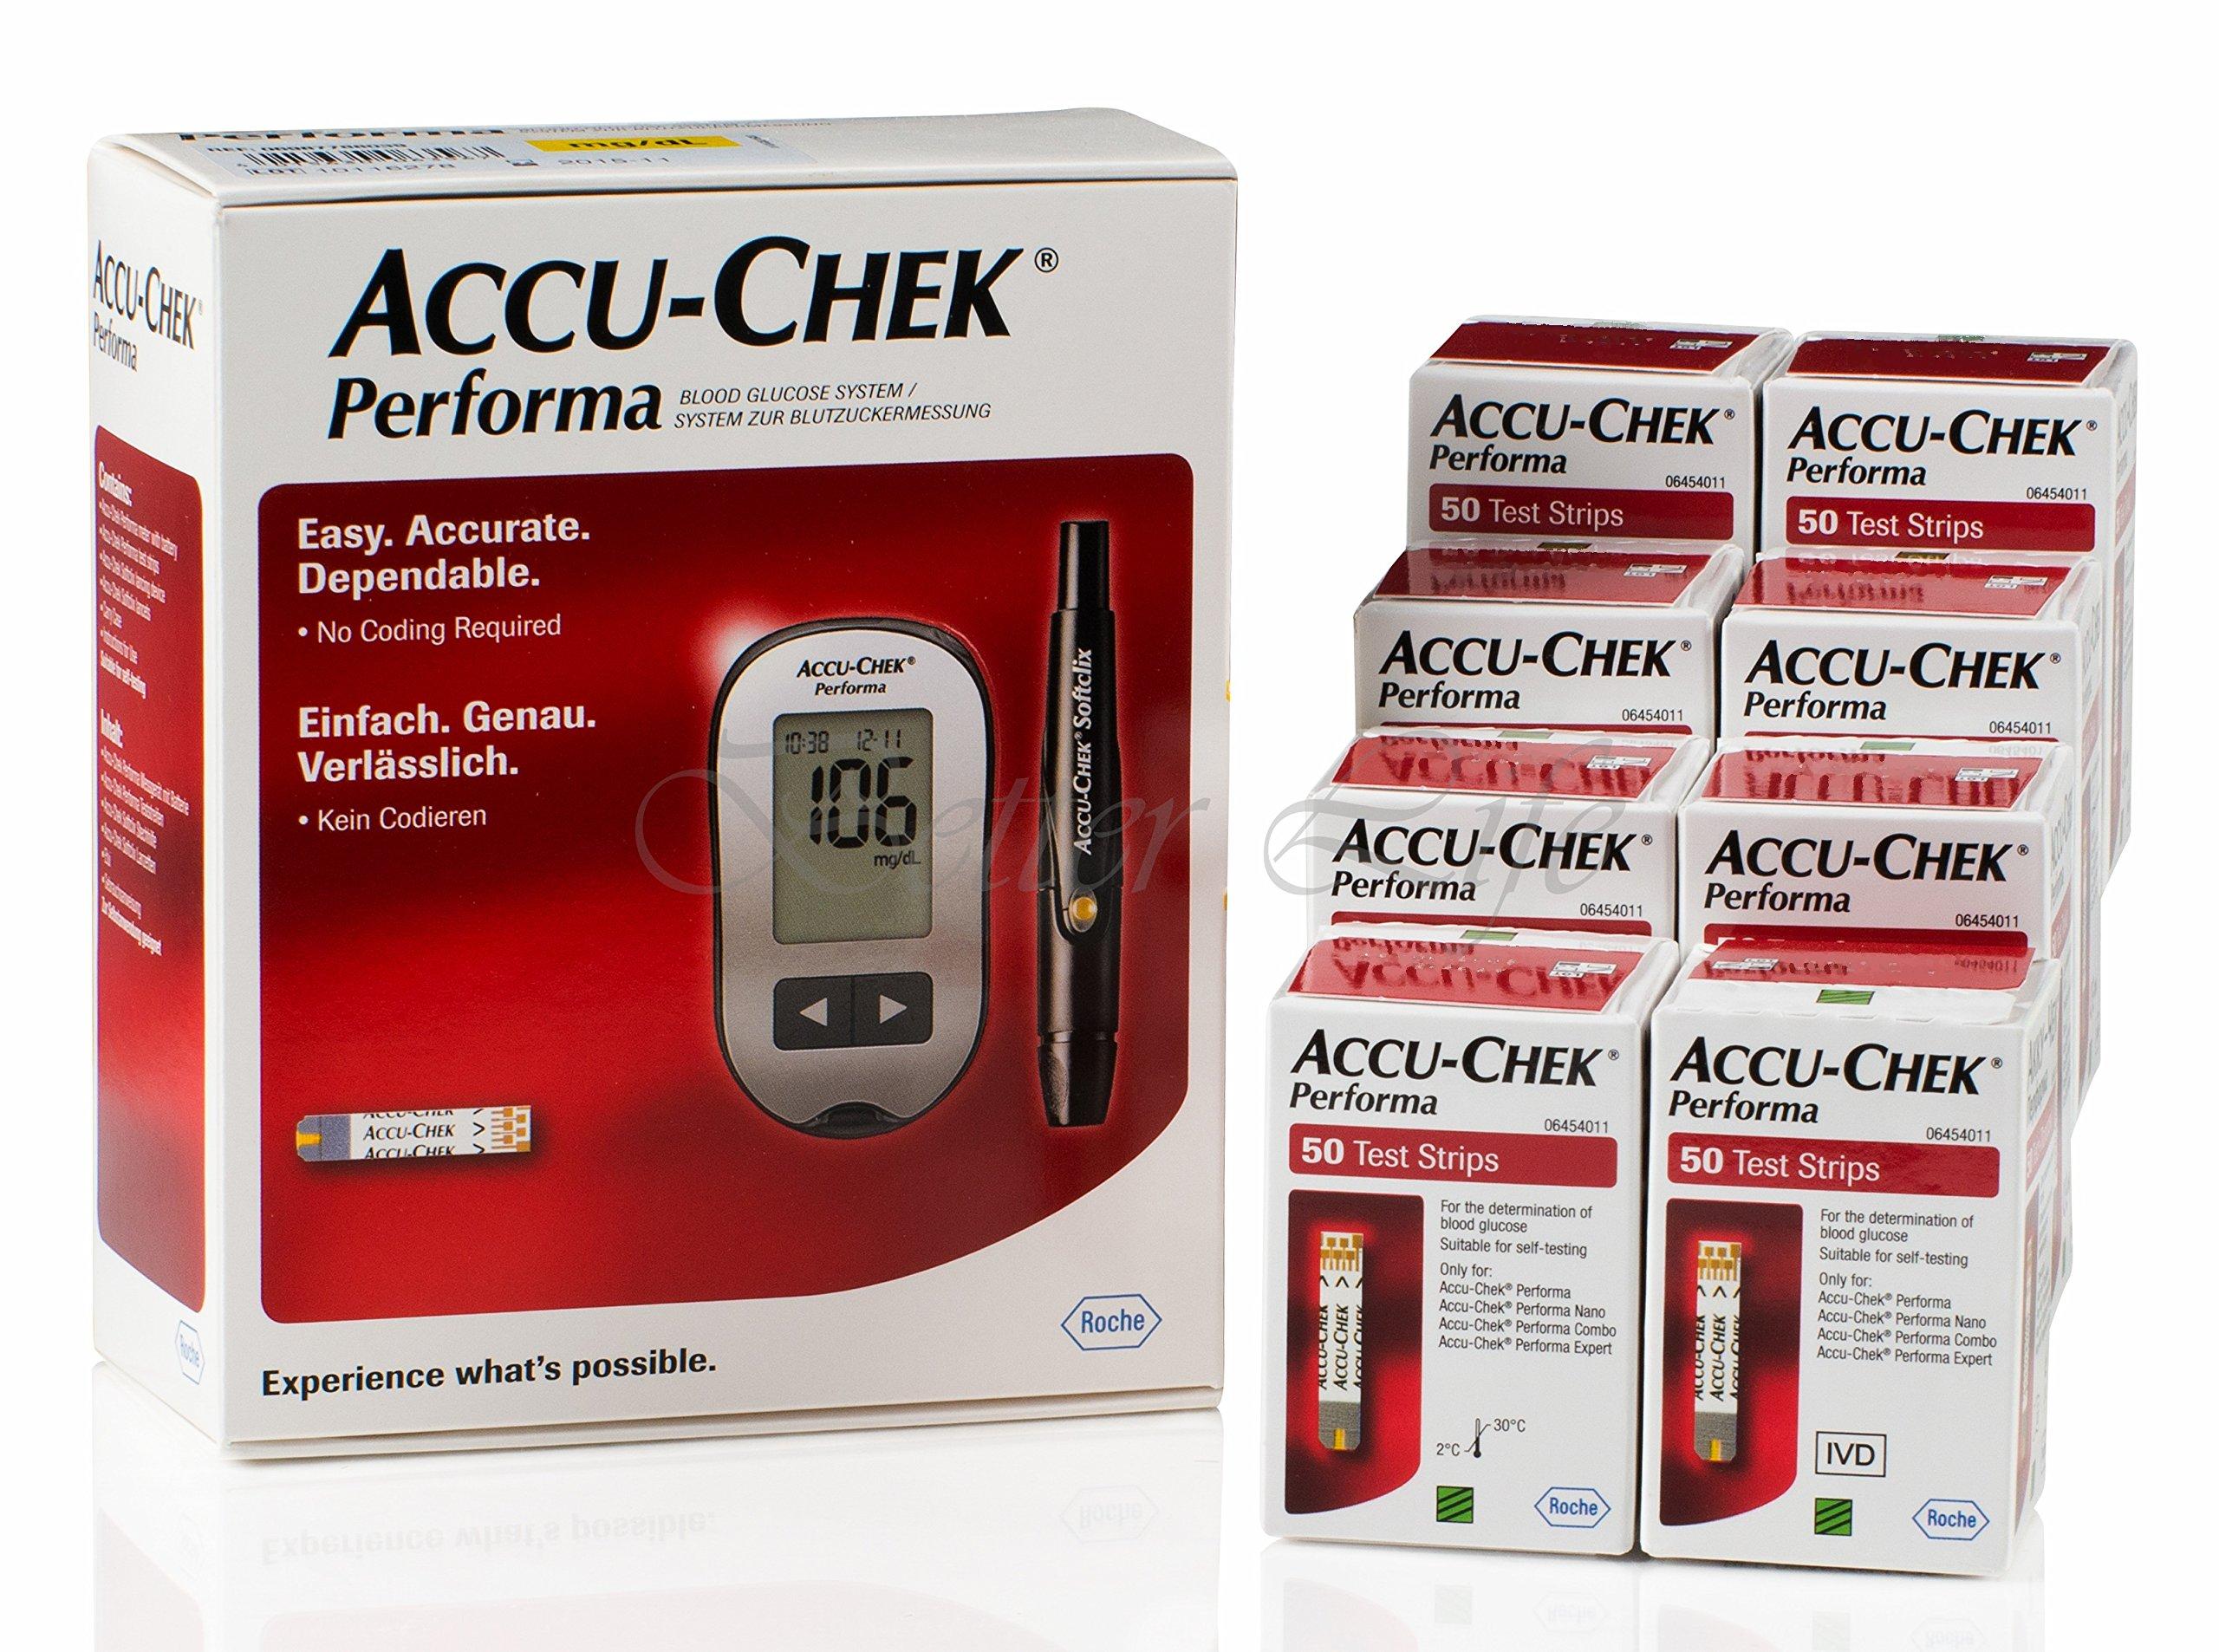 410 Accu Chek Performa Test Strips Plus Bonus - Glucometer Kit Lancets Softclix Very long expiration dates by Accu Chek